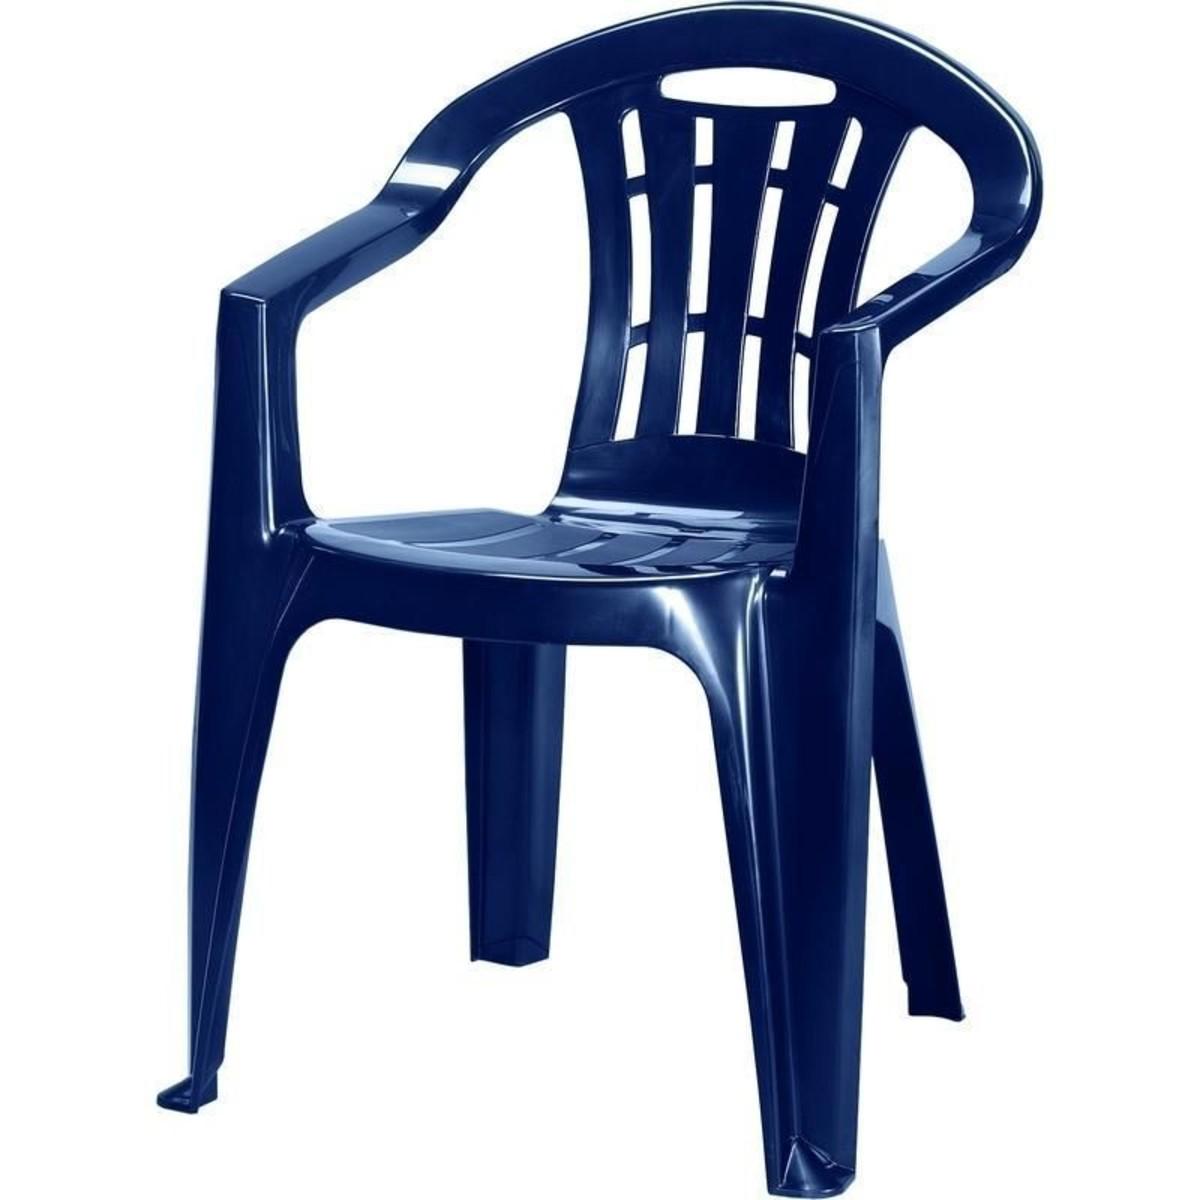 Кресло садовое Майорка синее 560x790x580 мм пластик